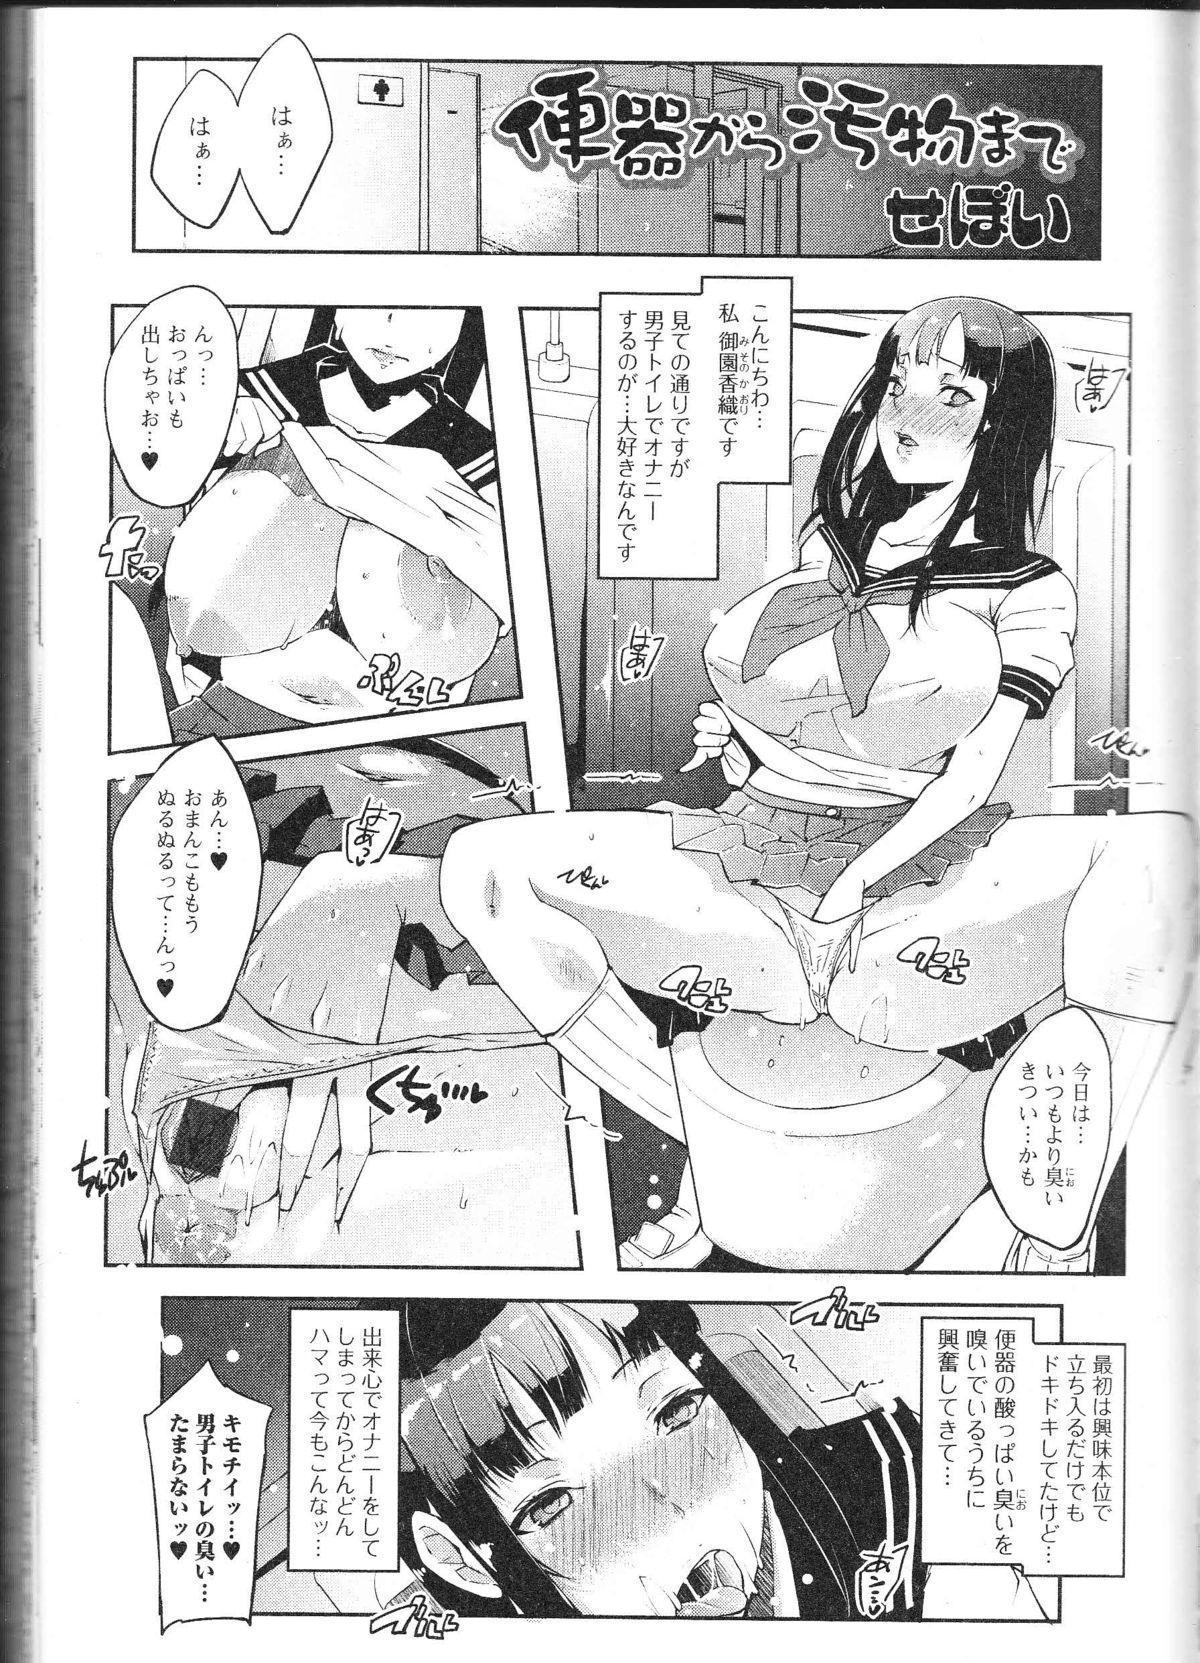 Nozoite wa Ikenai 9 - Do Not Peep! 9 67